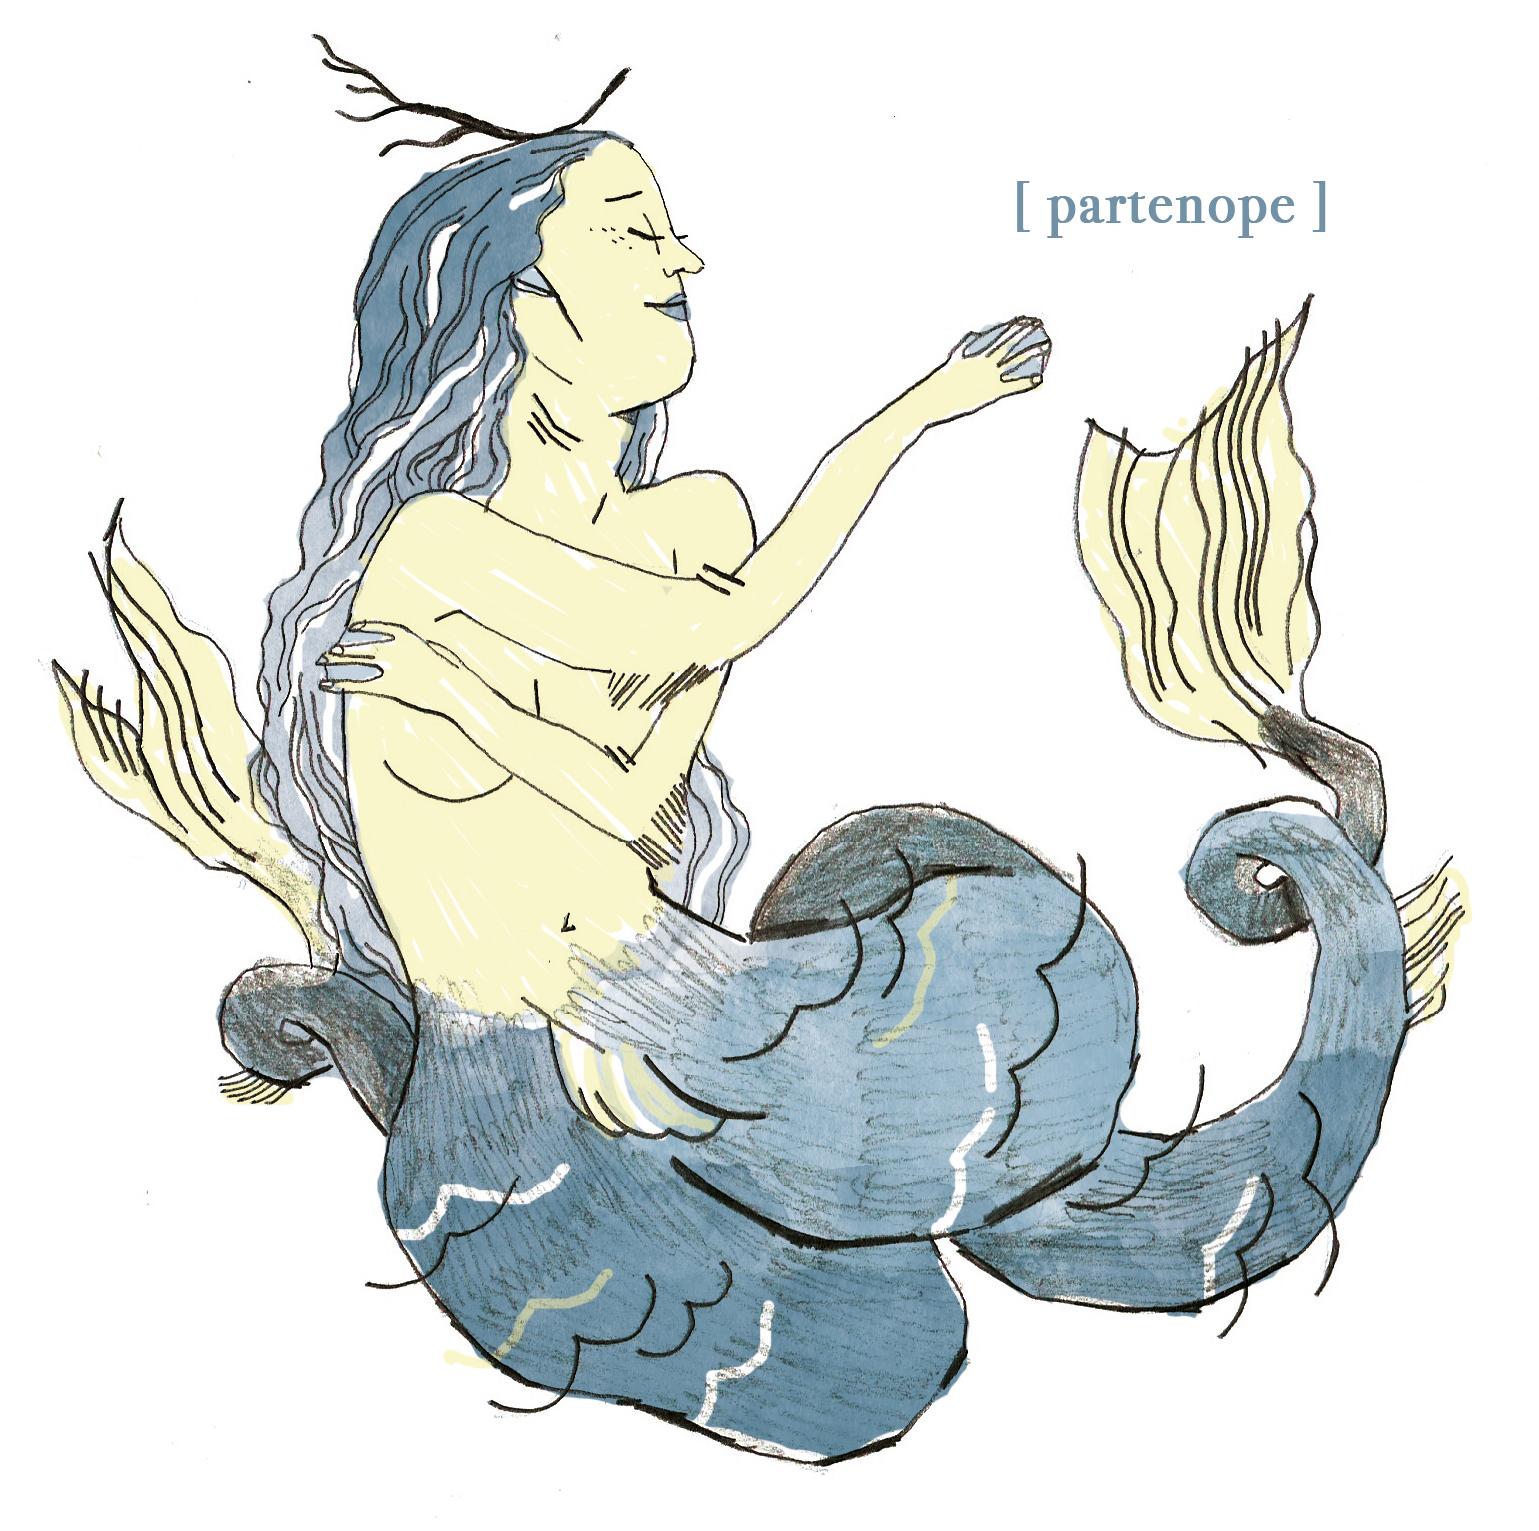 Sirena partenope